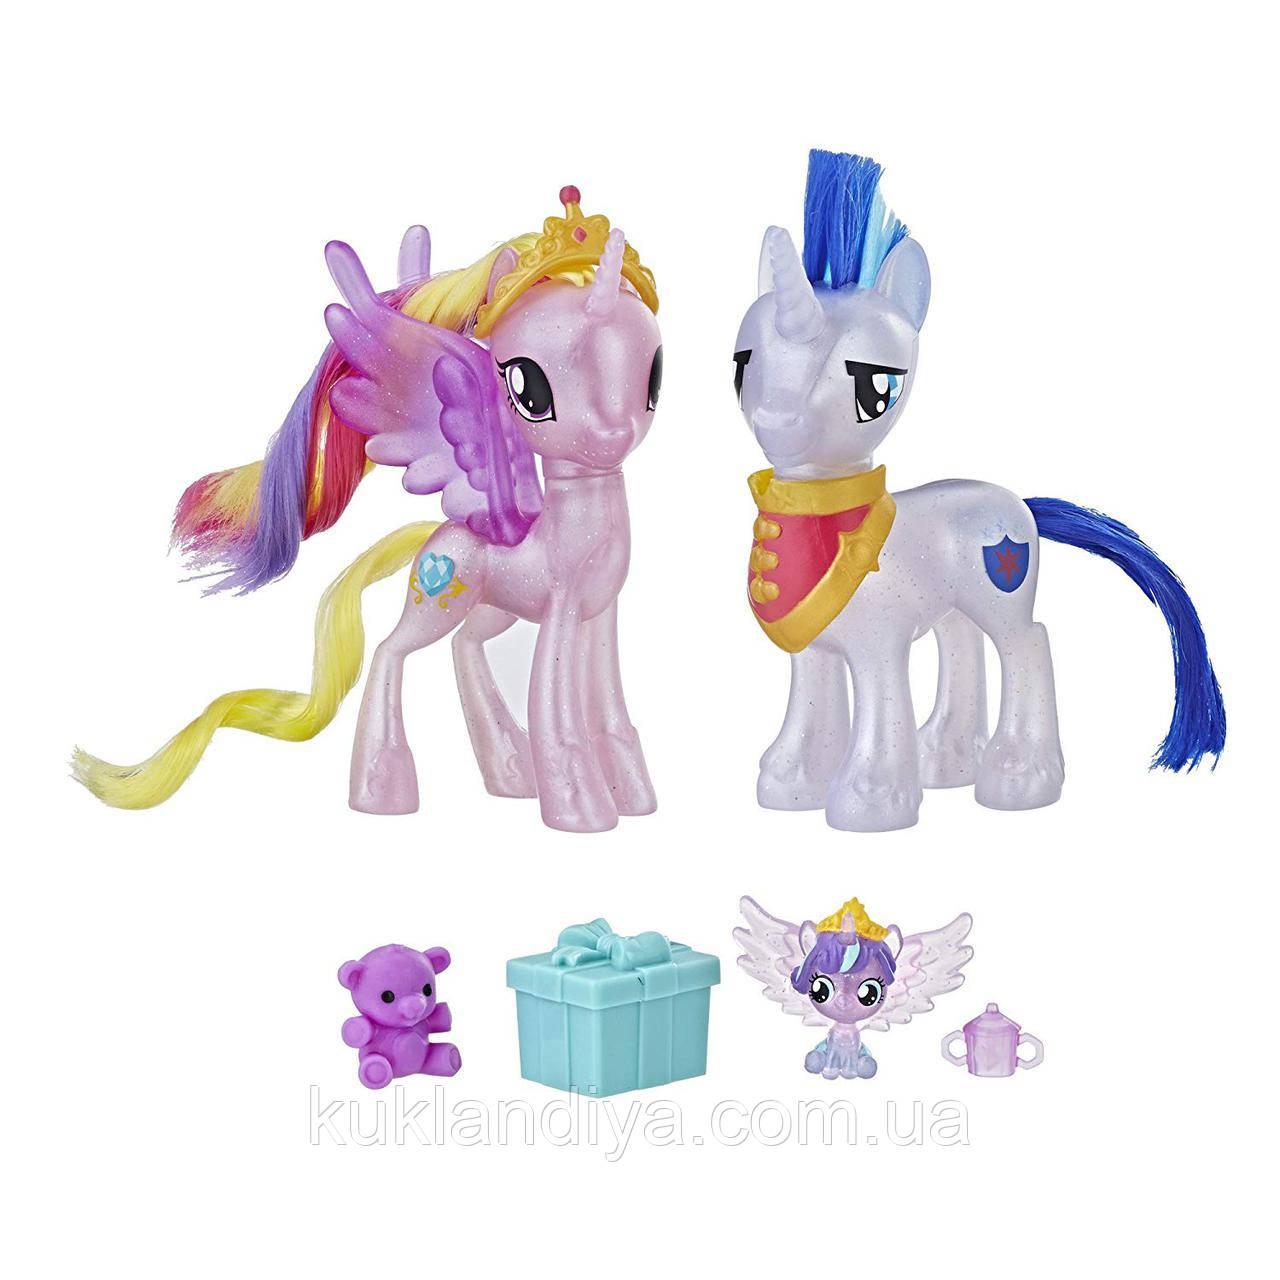 My Little Pony Принцесса Каденс, Шайнин Армор и Флари Харт набор Праздник